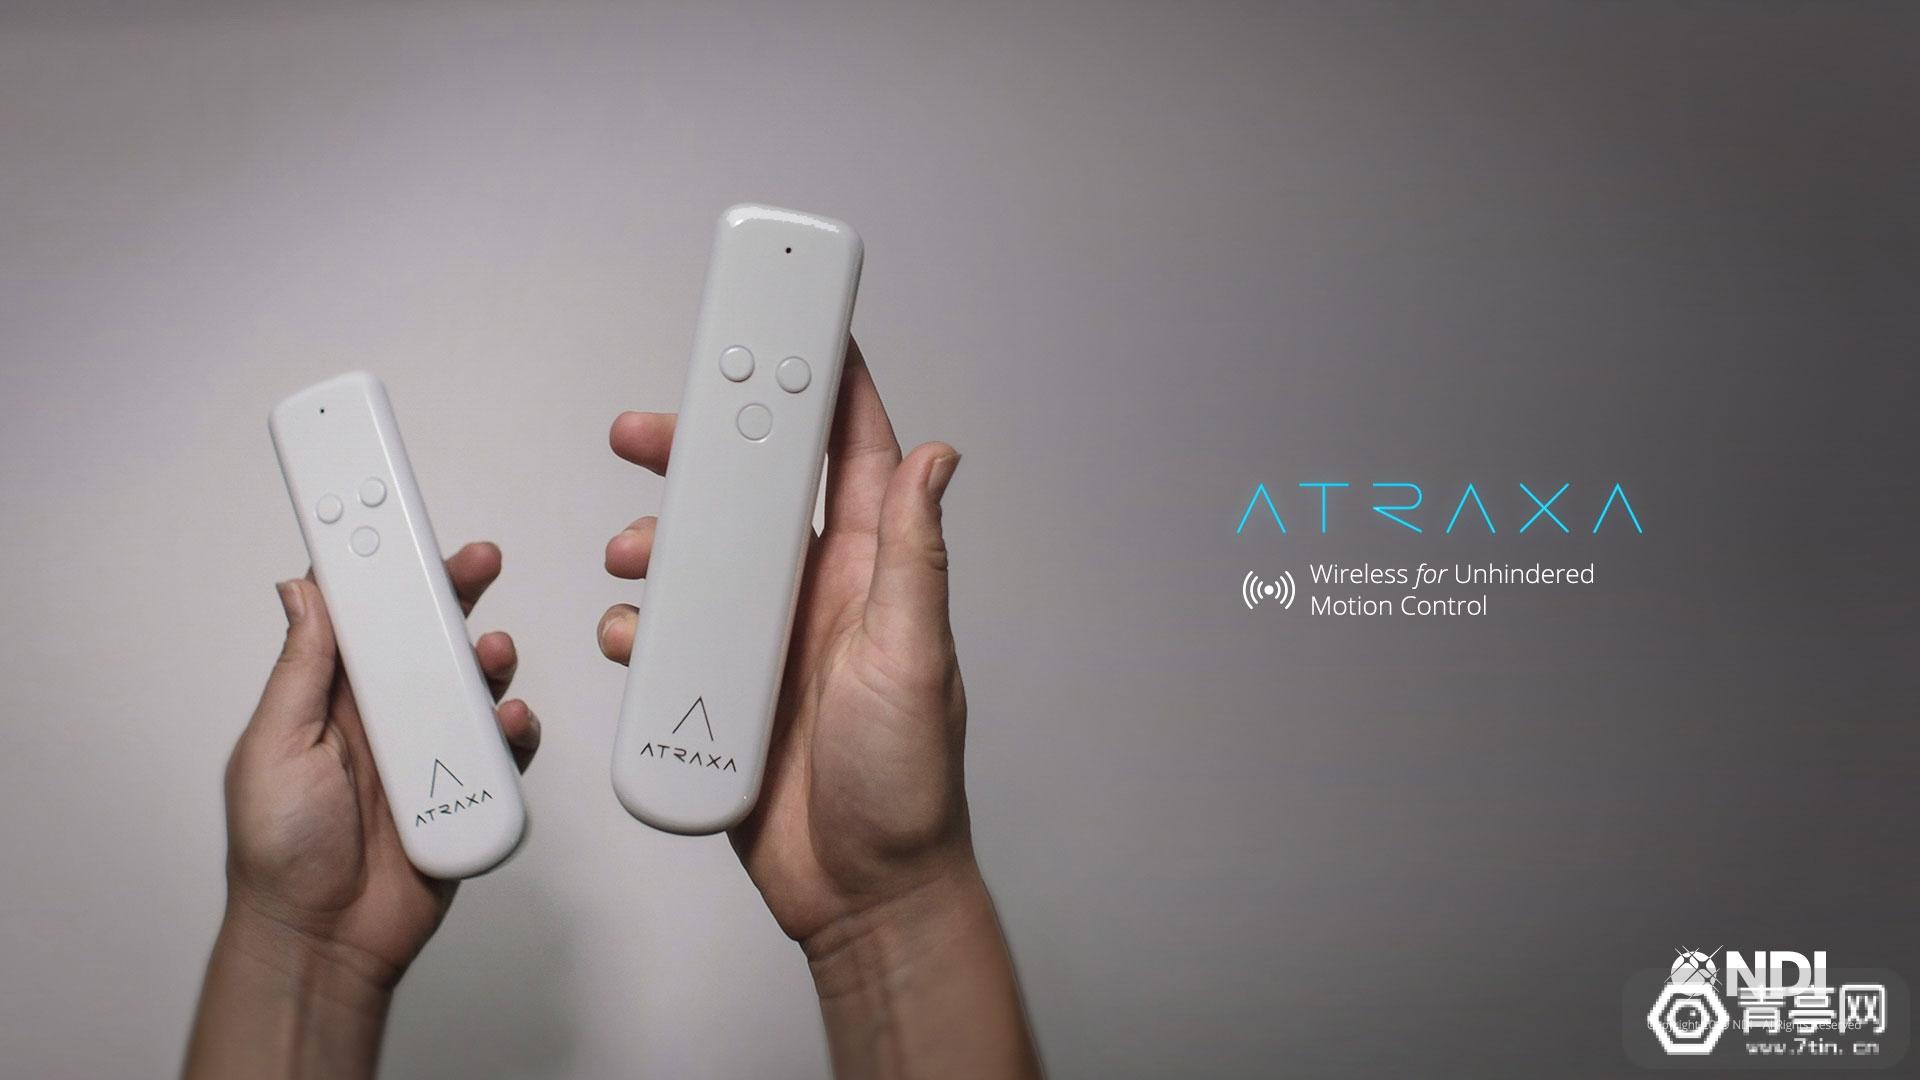 NDI展示6DoF电磁追踪手柄原型机,欲集成到AR/VR头显